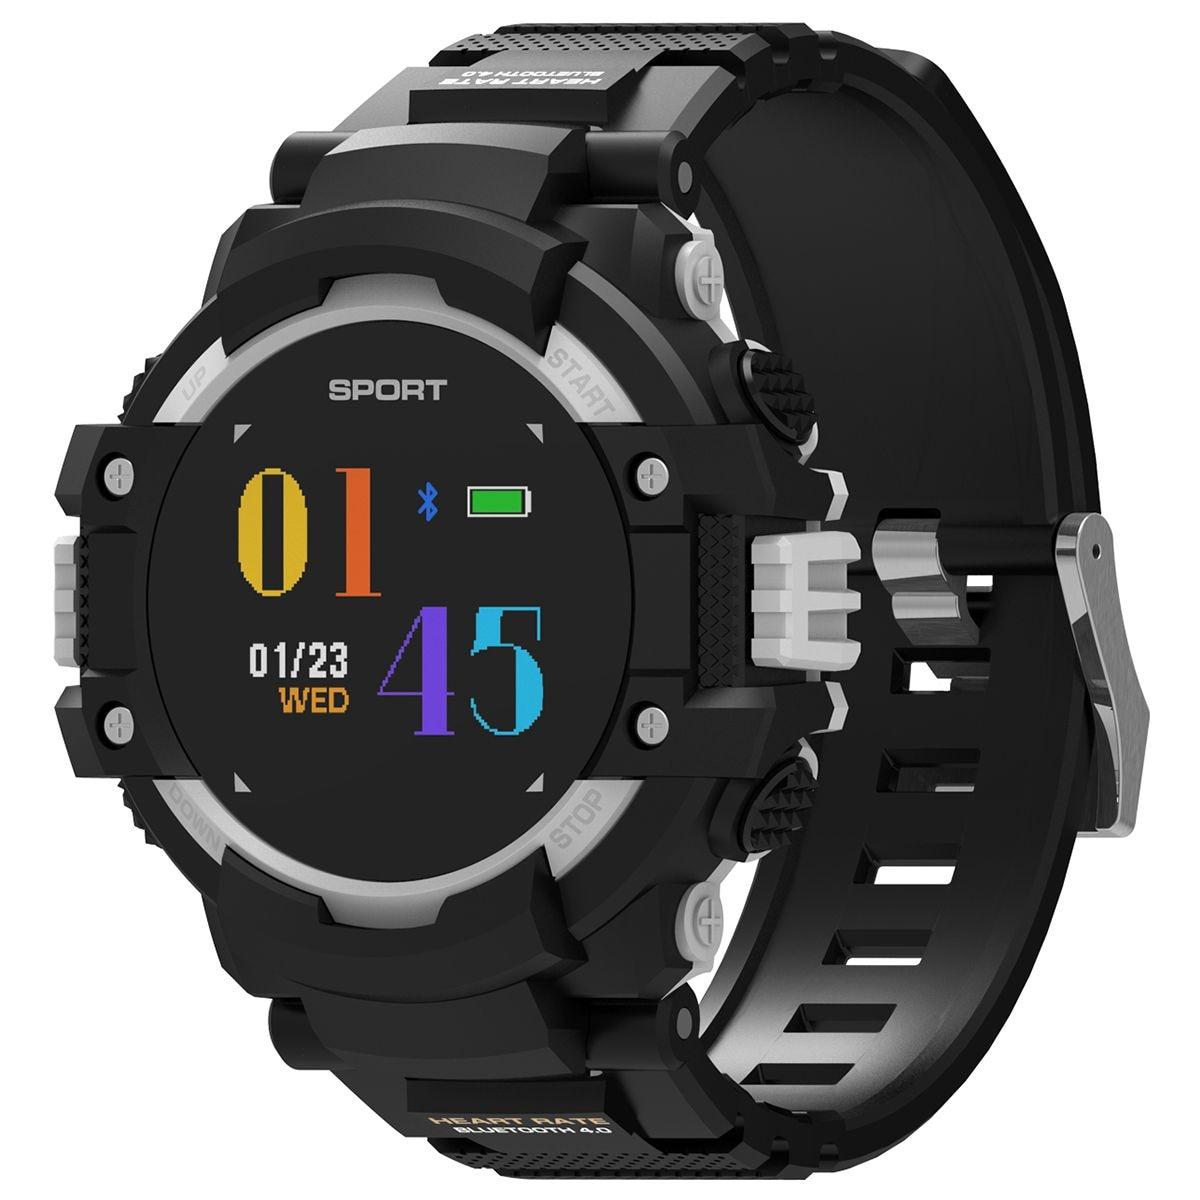 DTNO.1 F7 Atividade Rastreador GPS Dispositivos Wearable relógio Inteligente Bluetooth 4.2 relógio Altímetro Barômetro Bússola GPS ao ar livre